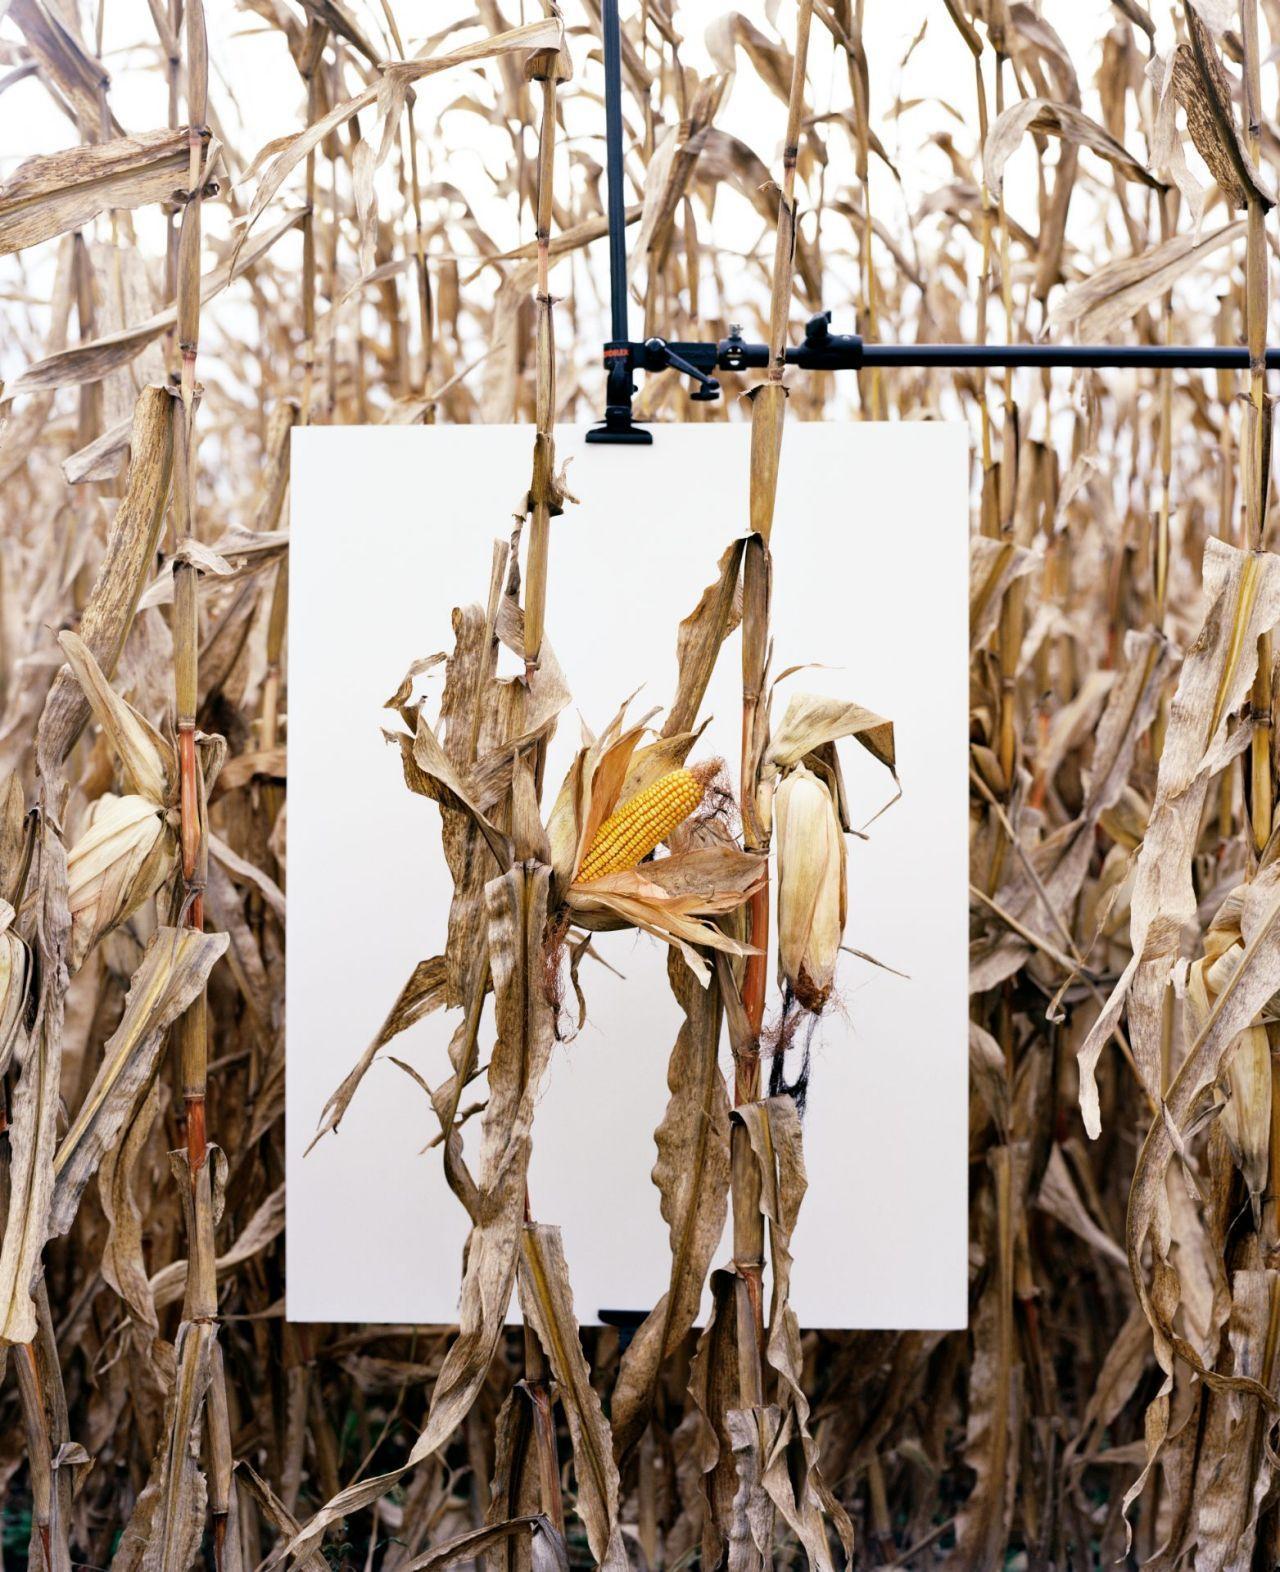 Monsanto®: A Photographic Investigation - Mathieu Asselin